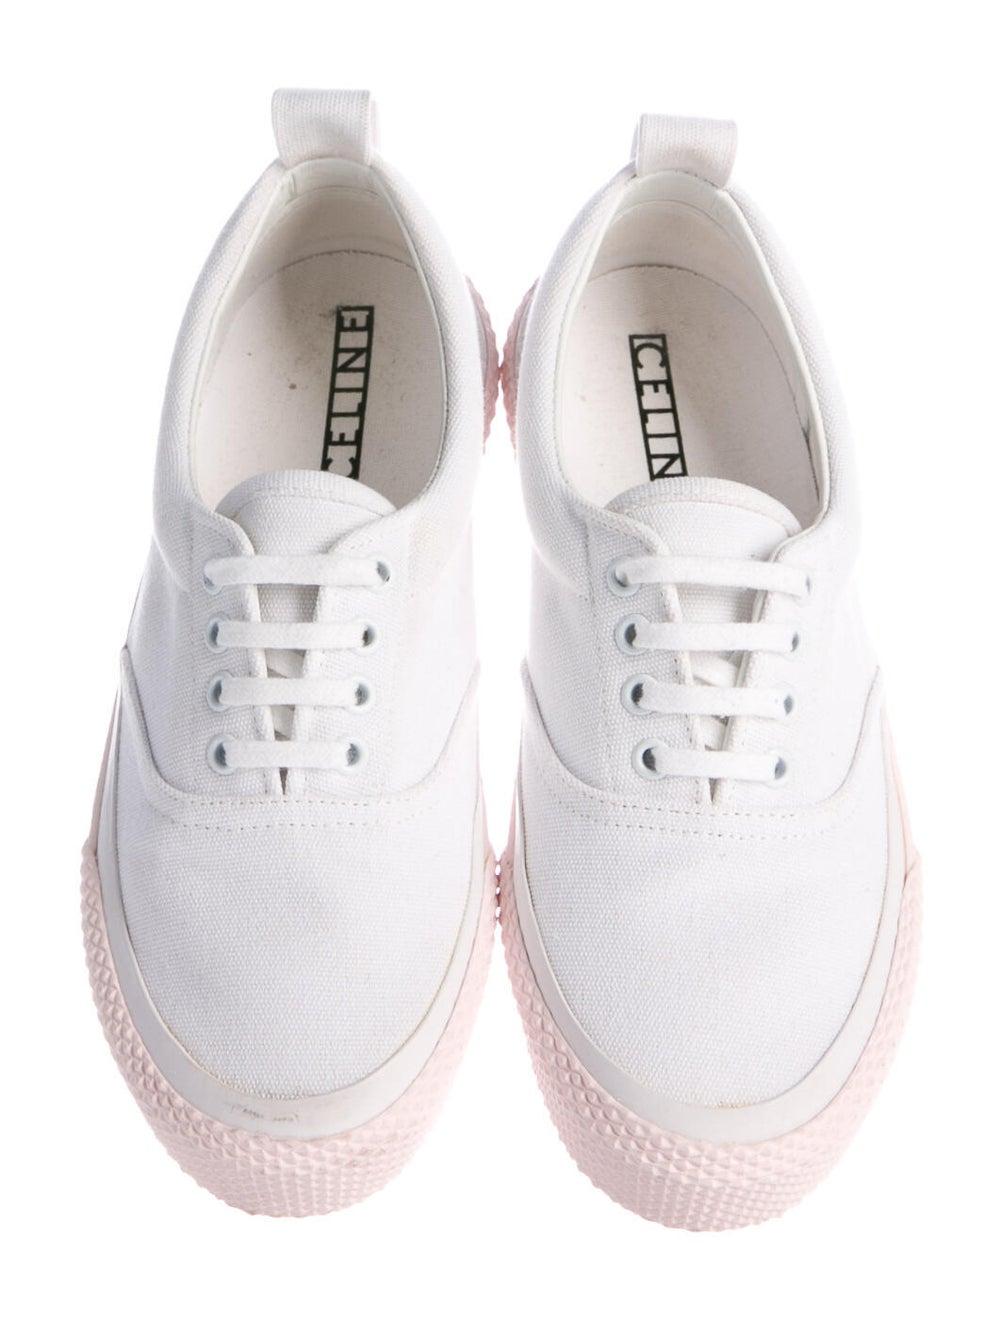 Celine 180 Sneakers White - image 3